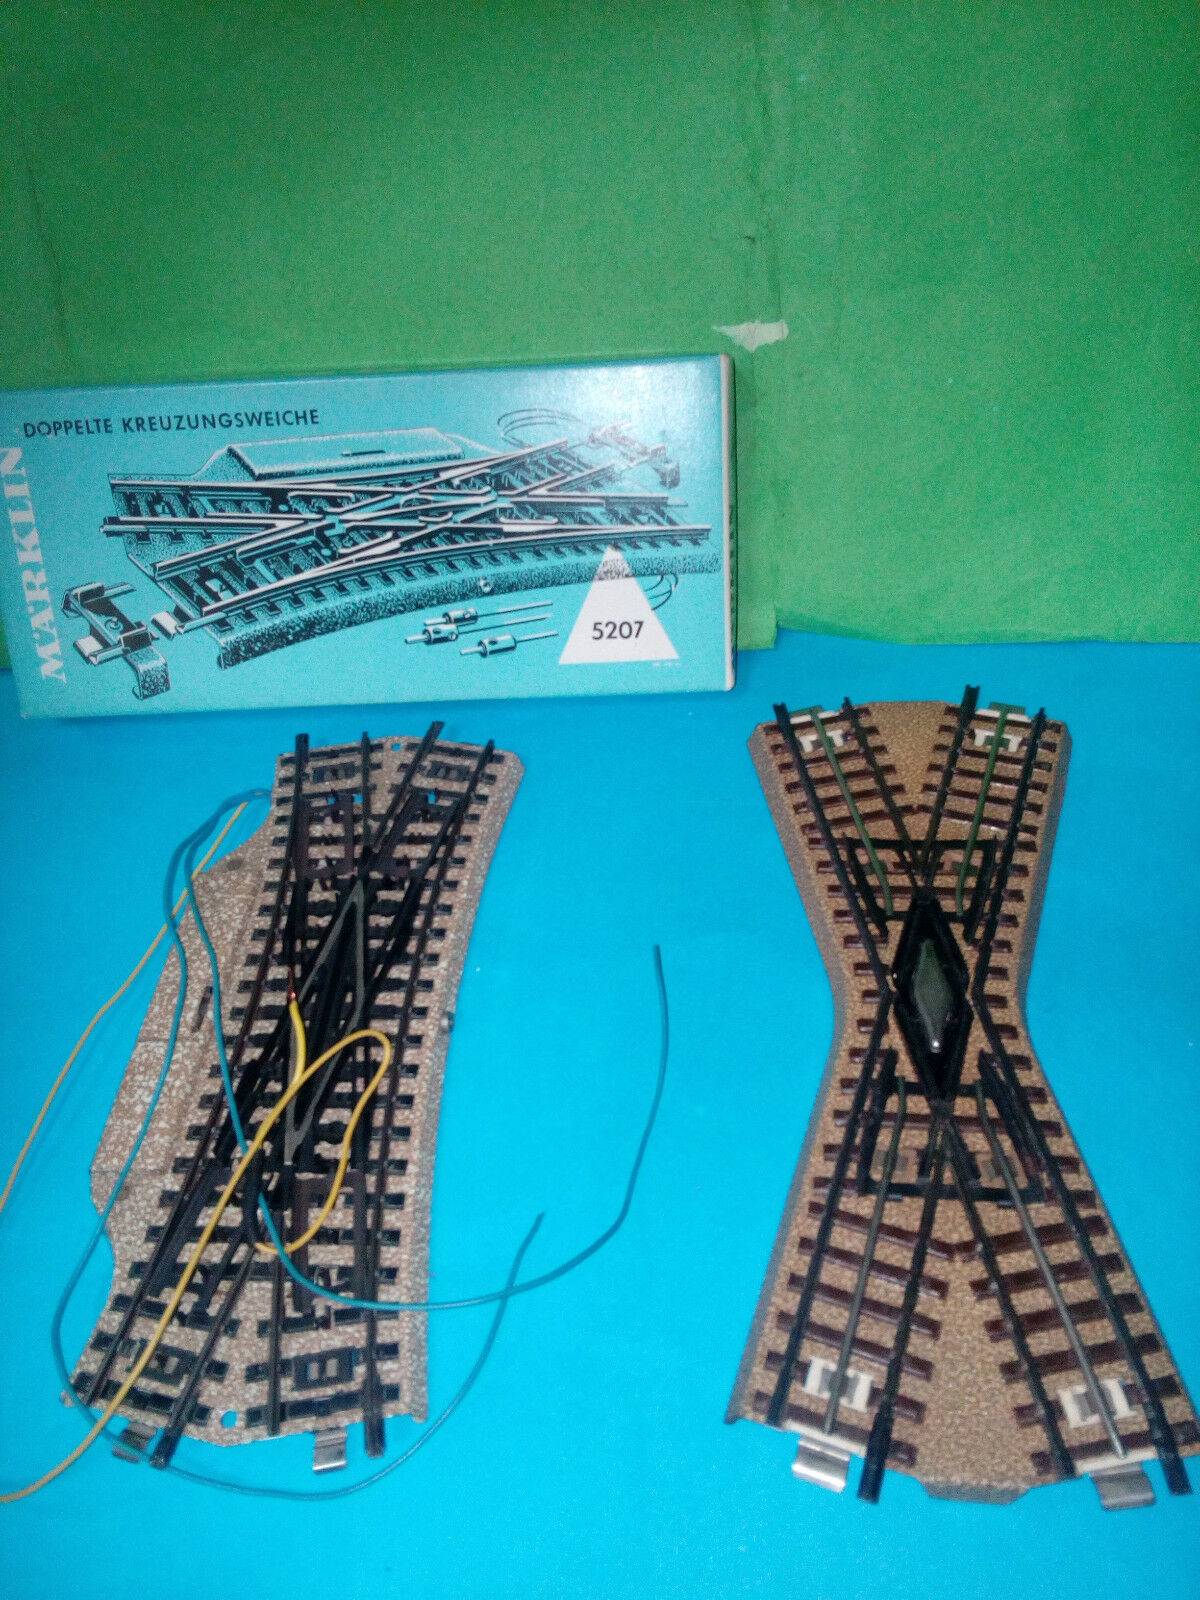 Marklin crossings English 5207 and third rail